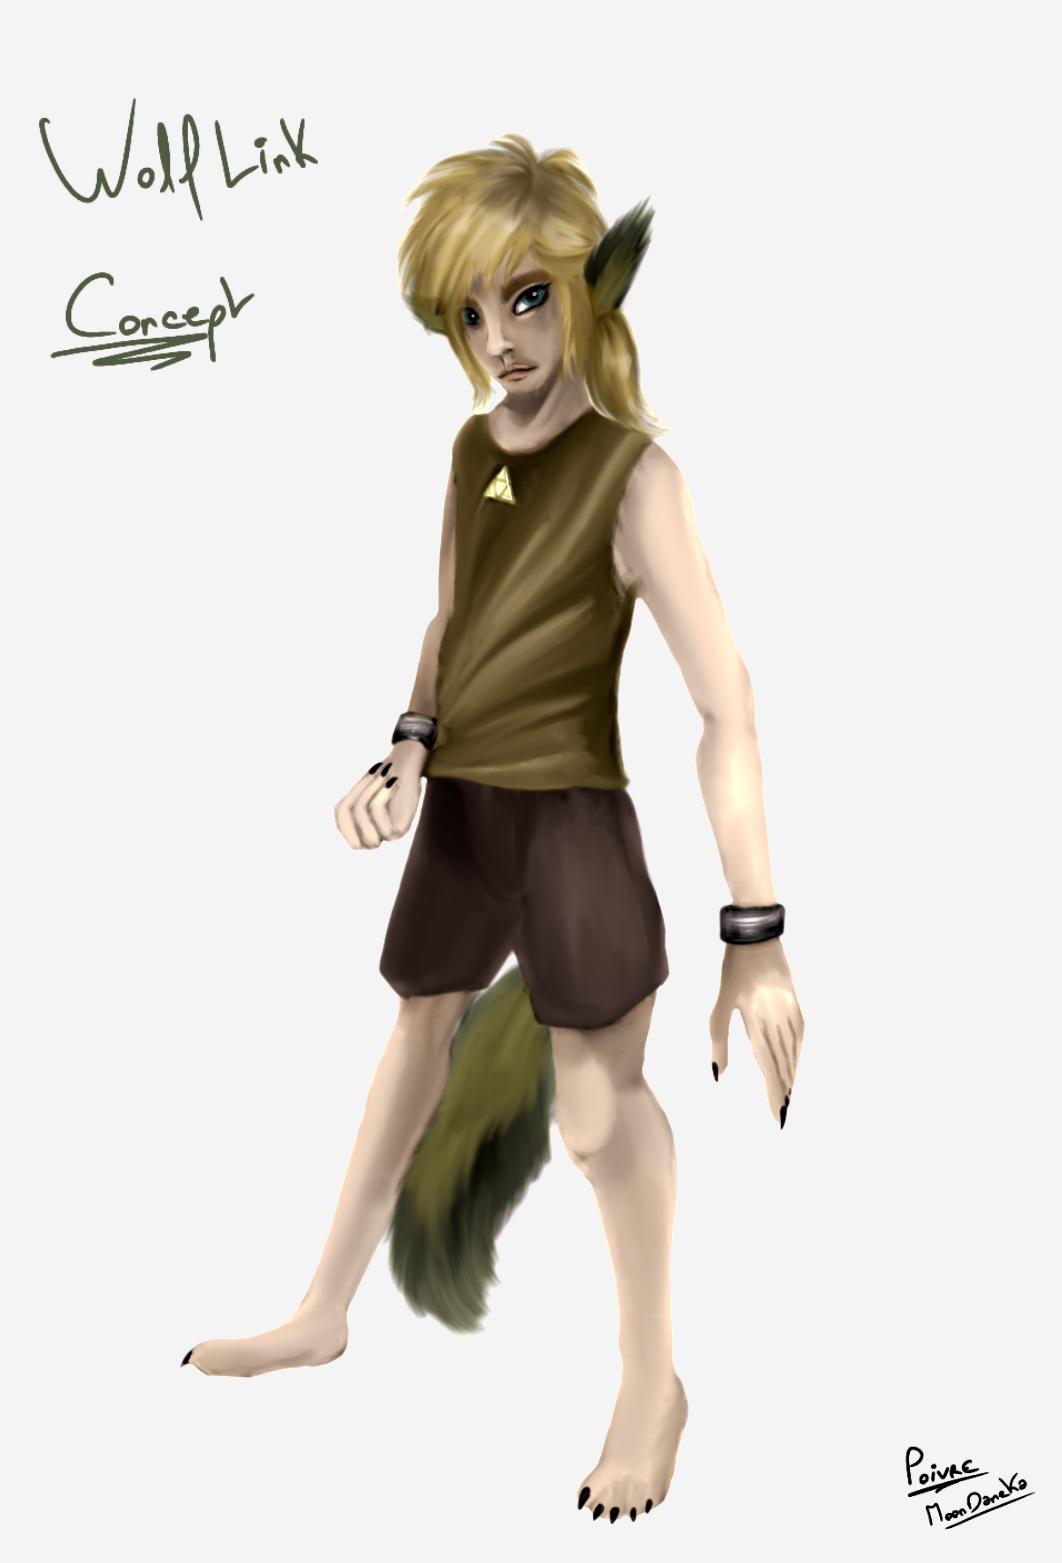 The Legends of Zelda - Wolf Link (concept art) by moondaneka